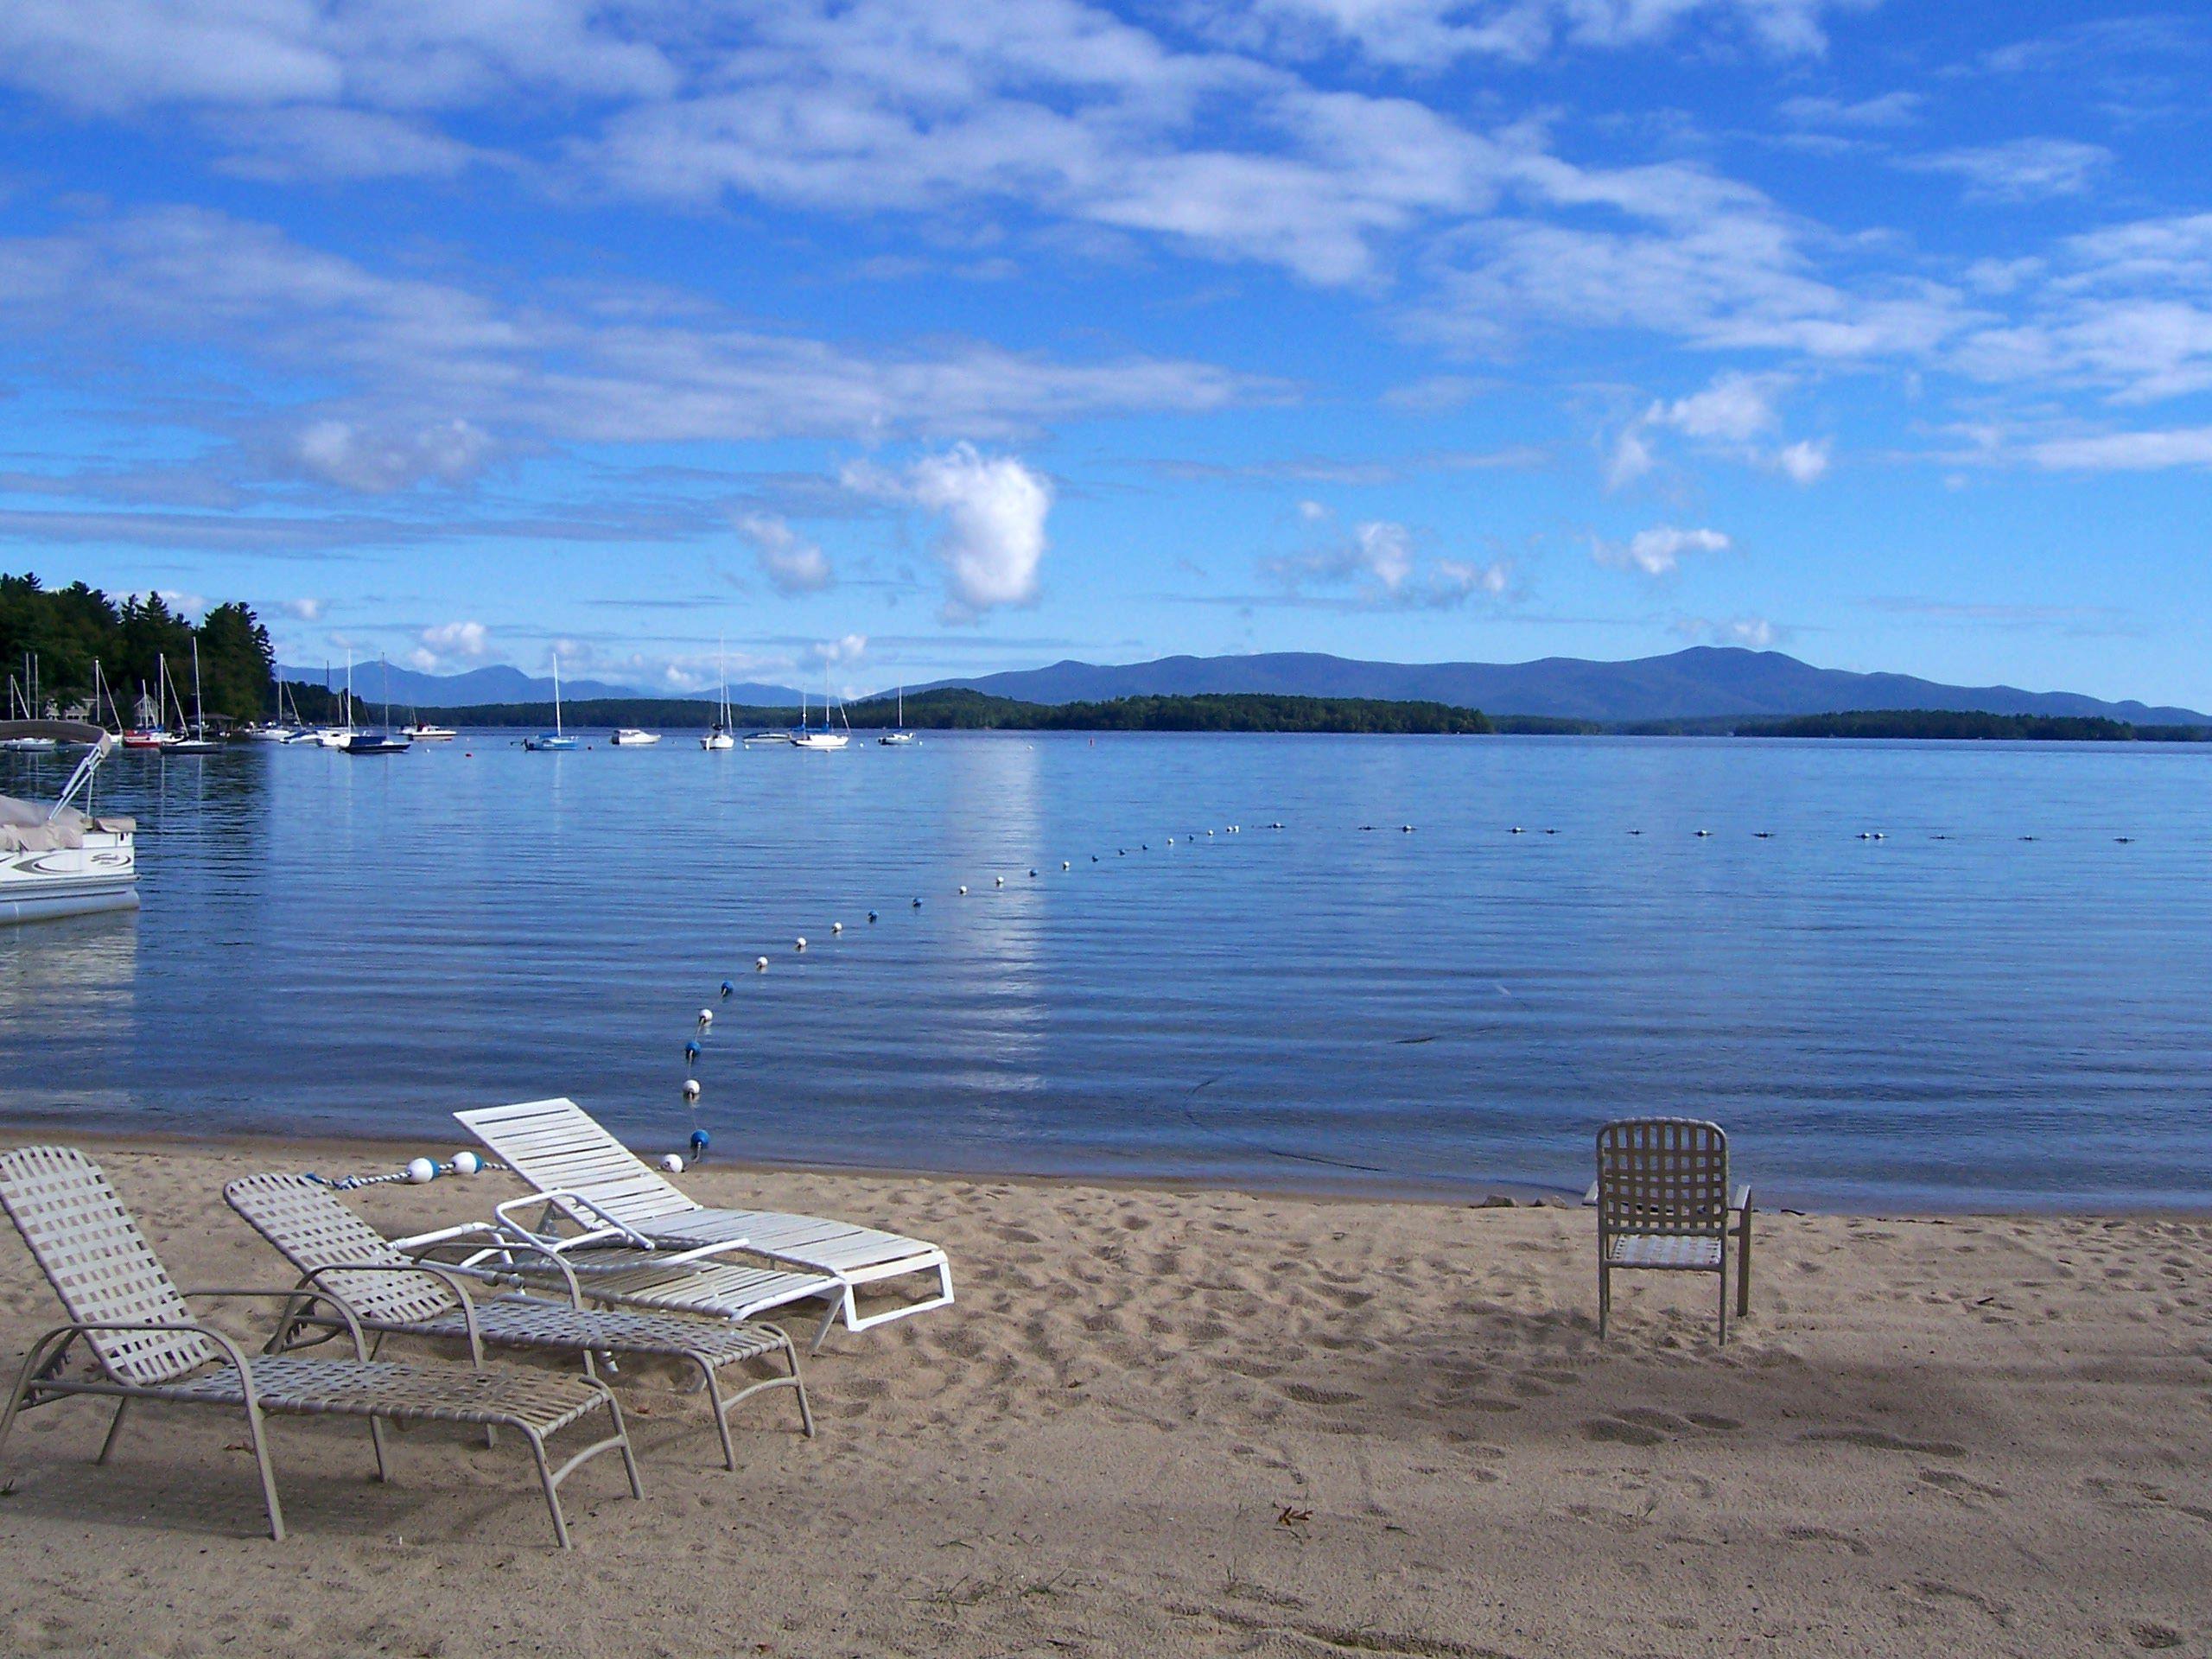 Barefoot Beach, Lake Winnepesaukee, NH